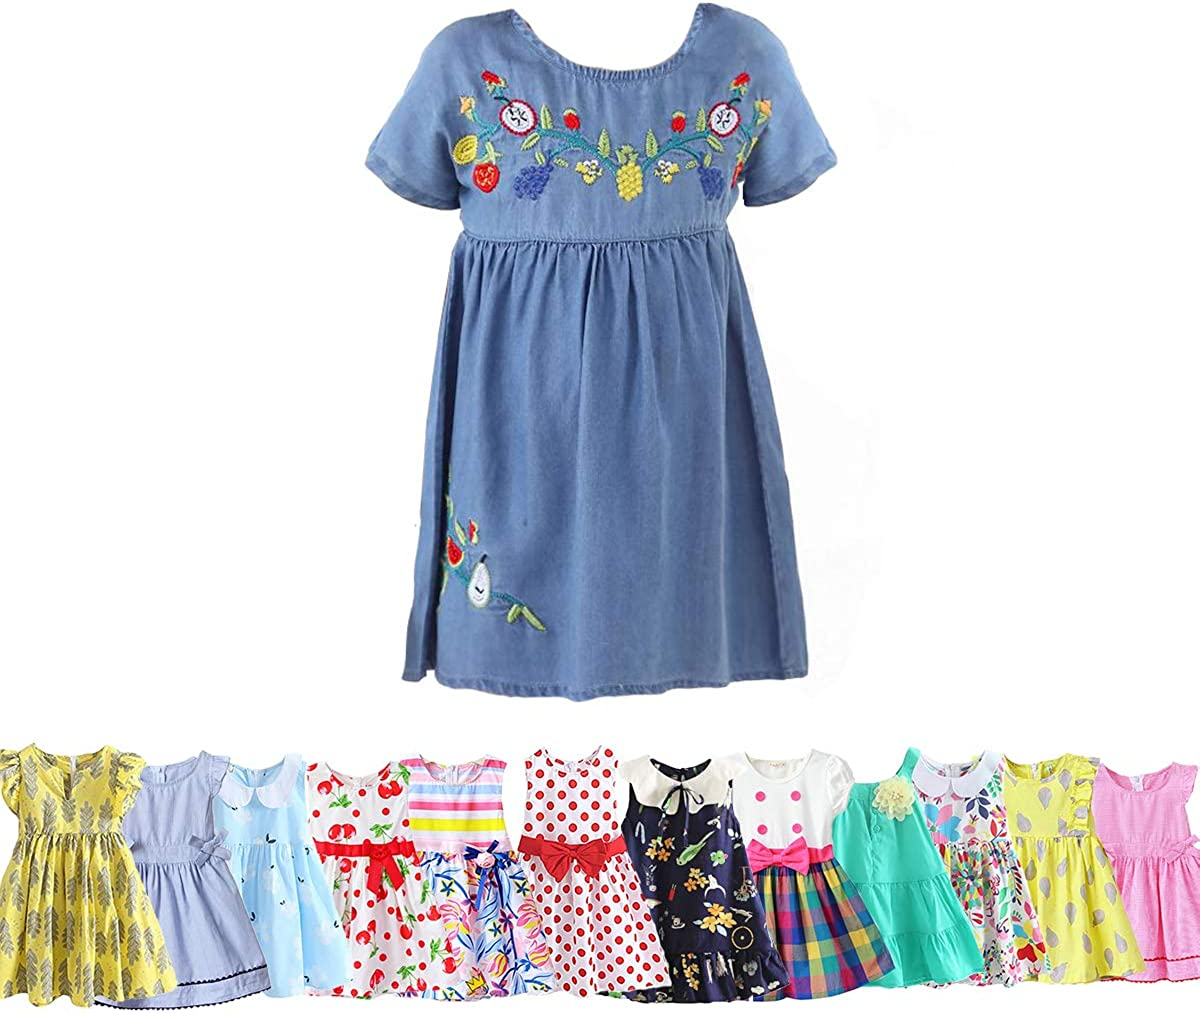 Abalacoco Girls Kids 100/% Cotton Soft Grid Summer Short Sleeve Sundress Casual Toddler Tutu Party Dress